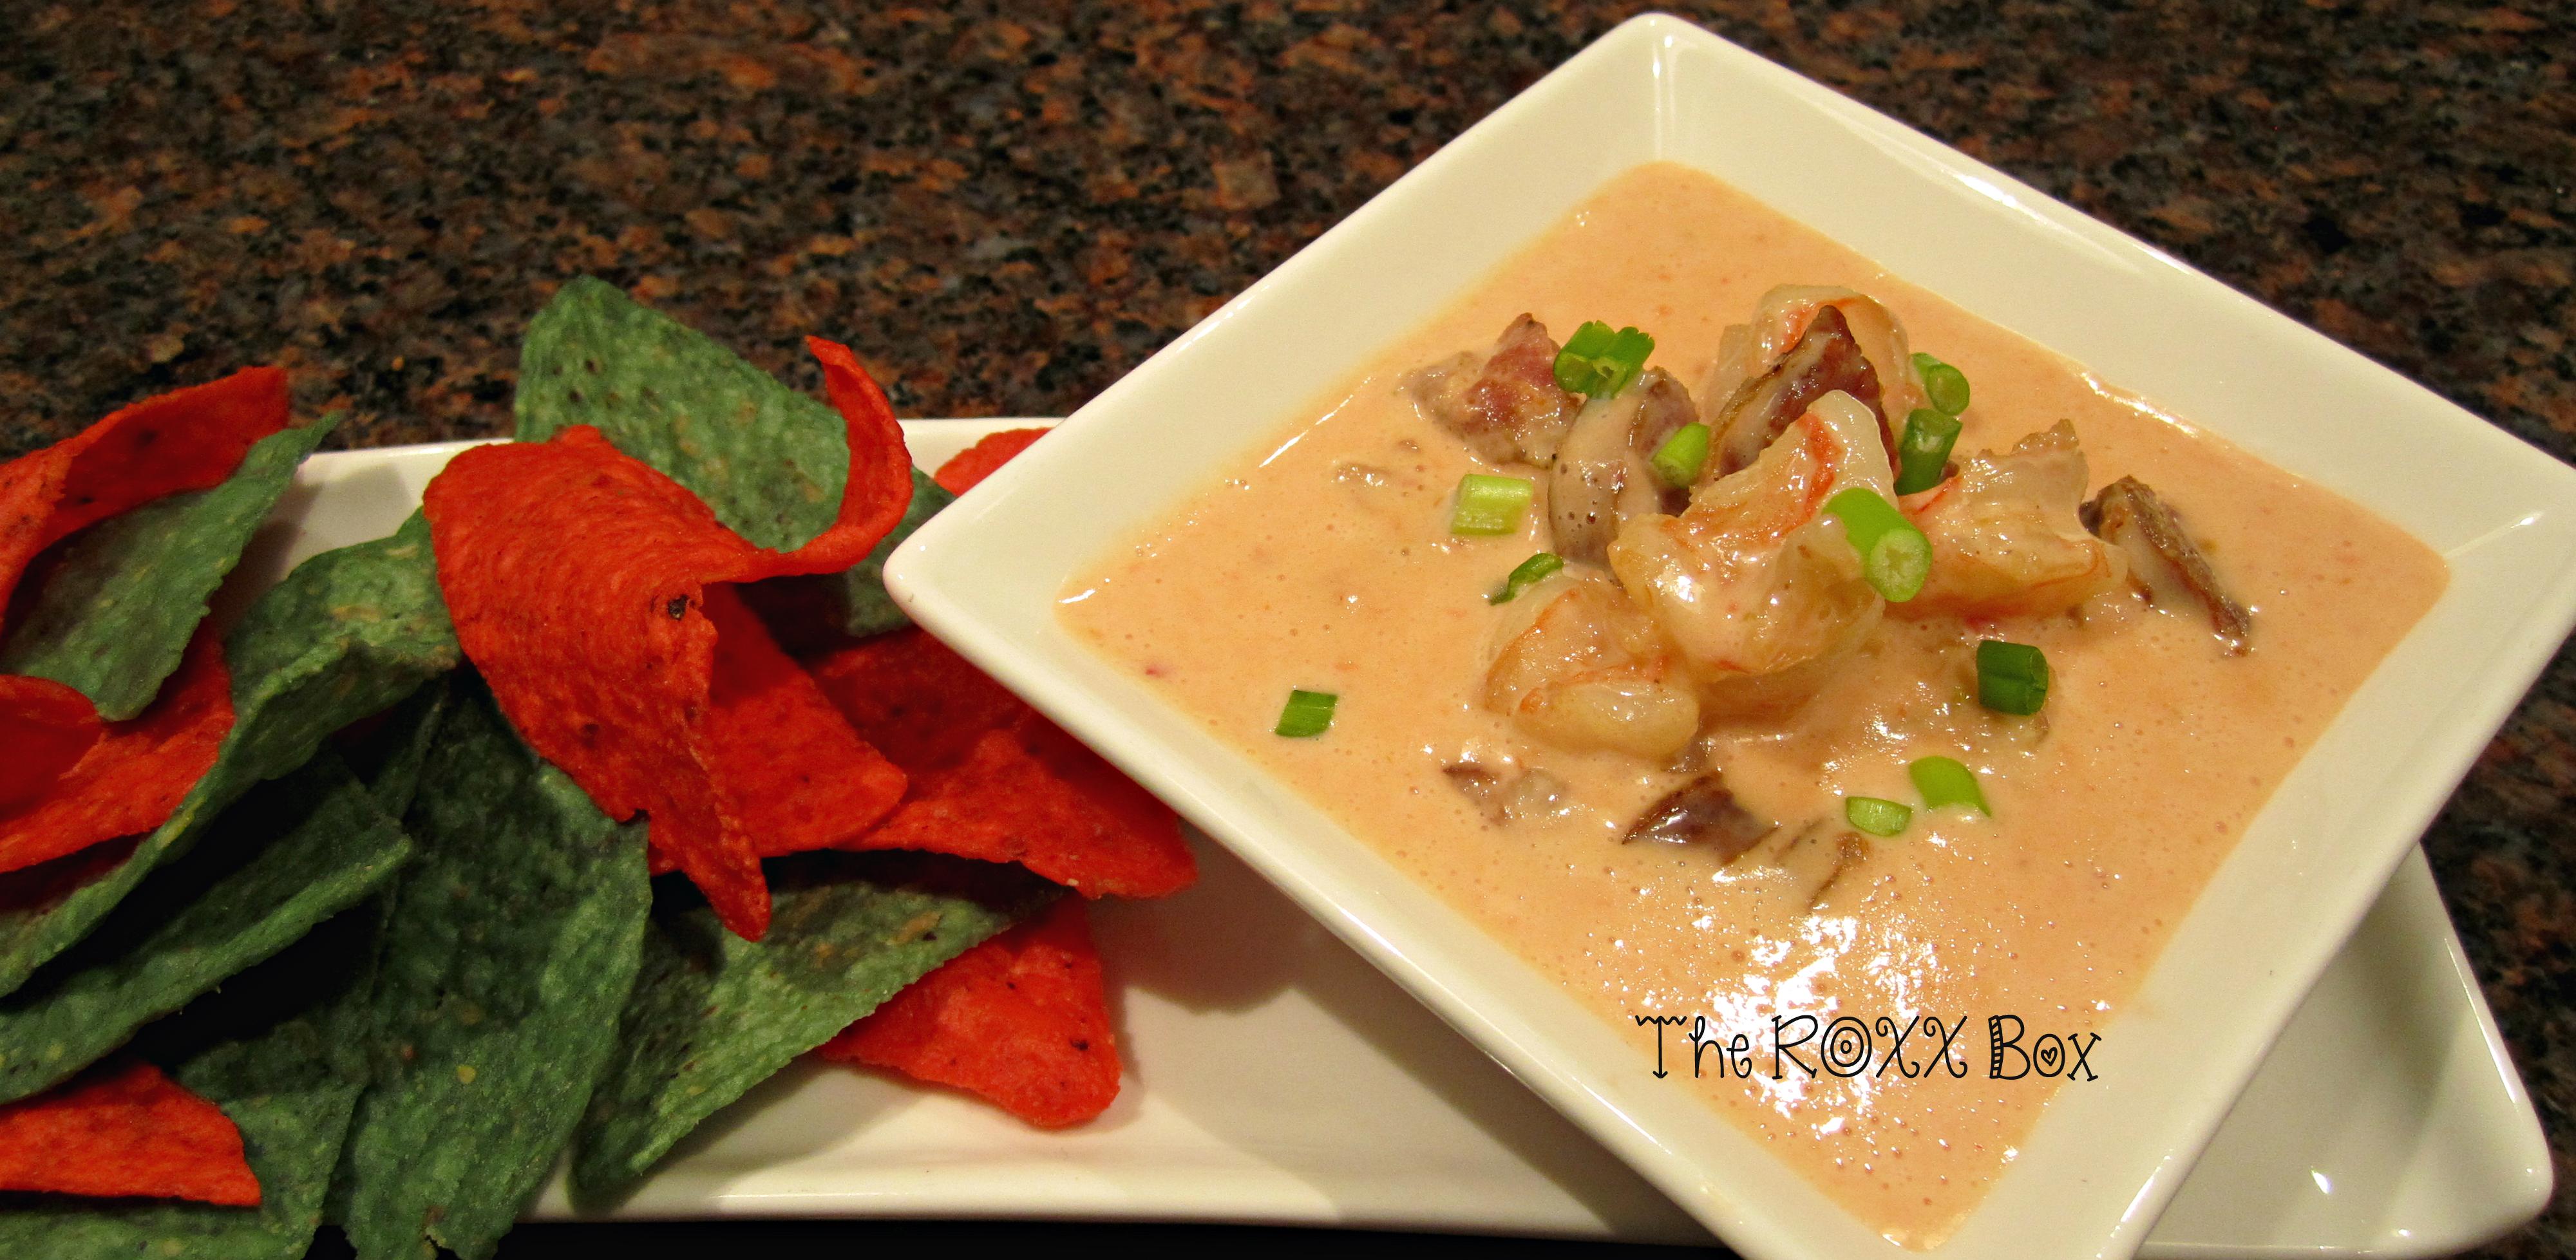 Roxanne's Shrimp & Andouille Sausage Queso Dip